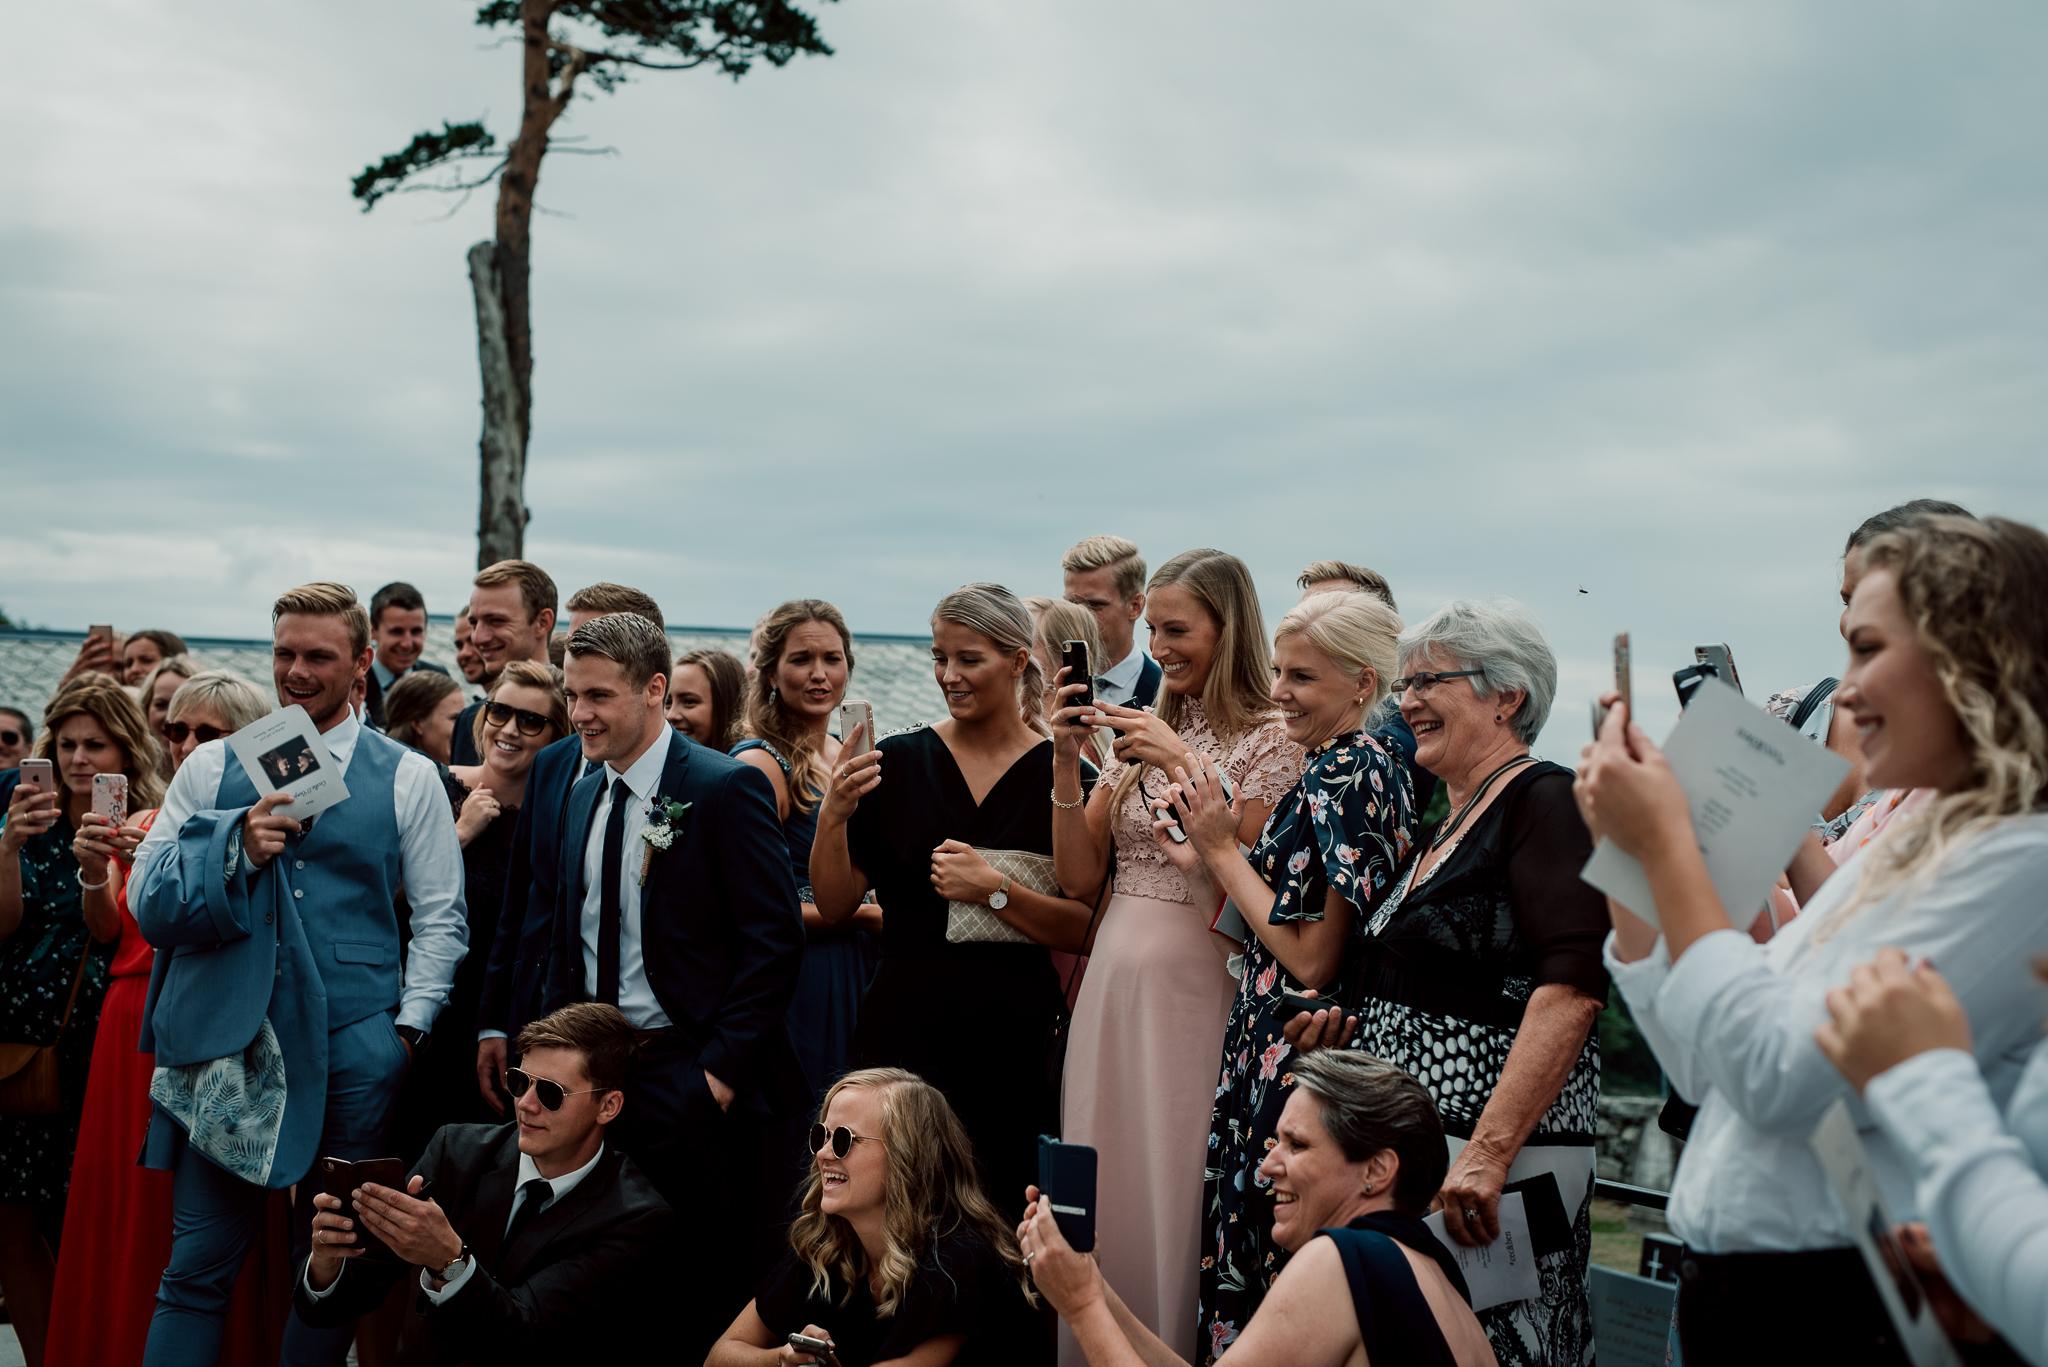 Bryllup-løen-på-sunde-bryllupsfotograf-Stavanger-Lofoten-Bergen-Oslo-24.jpg